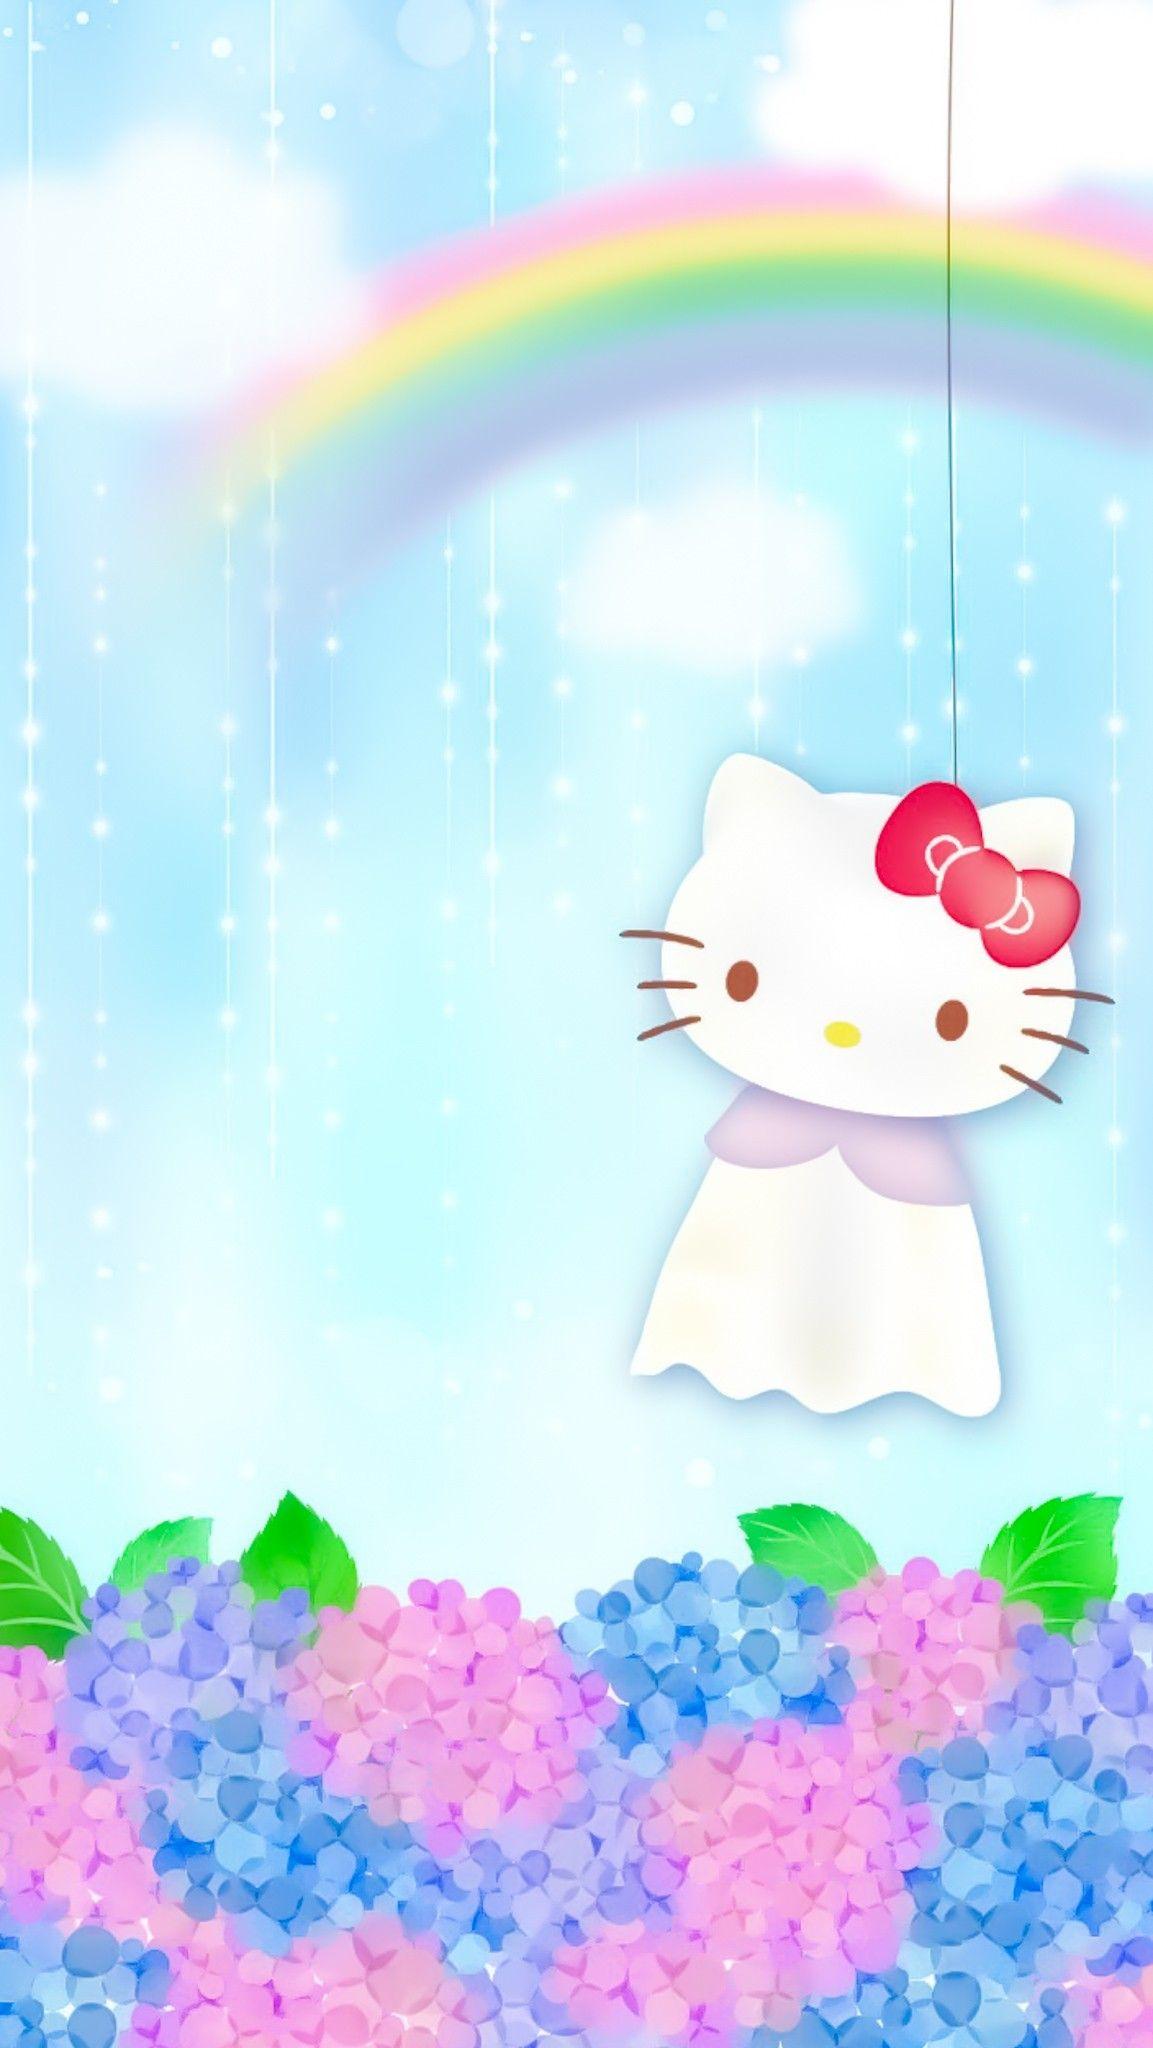 pin by aekkalisa on hello kitty bg hello kitty iphone wallpaper hello kitty wallpaper hello kitty